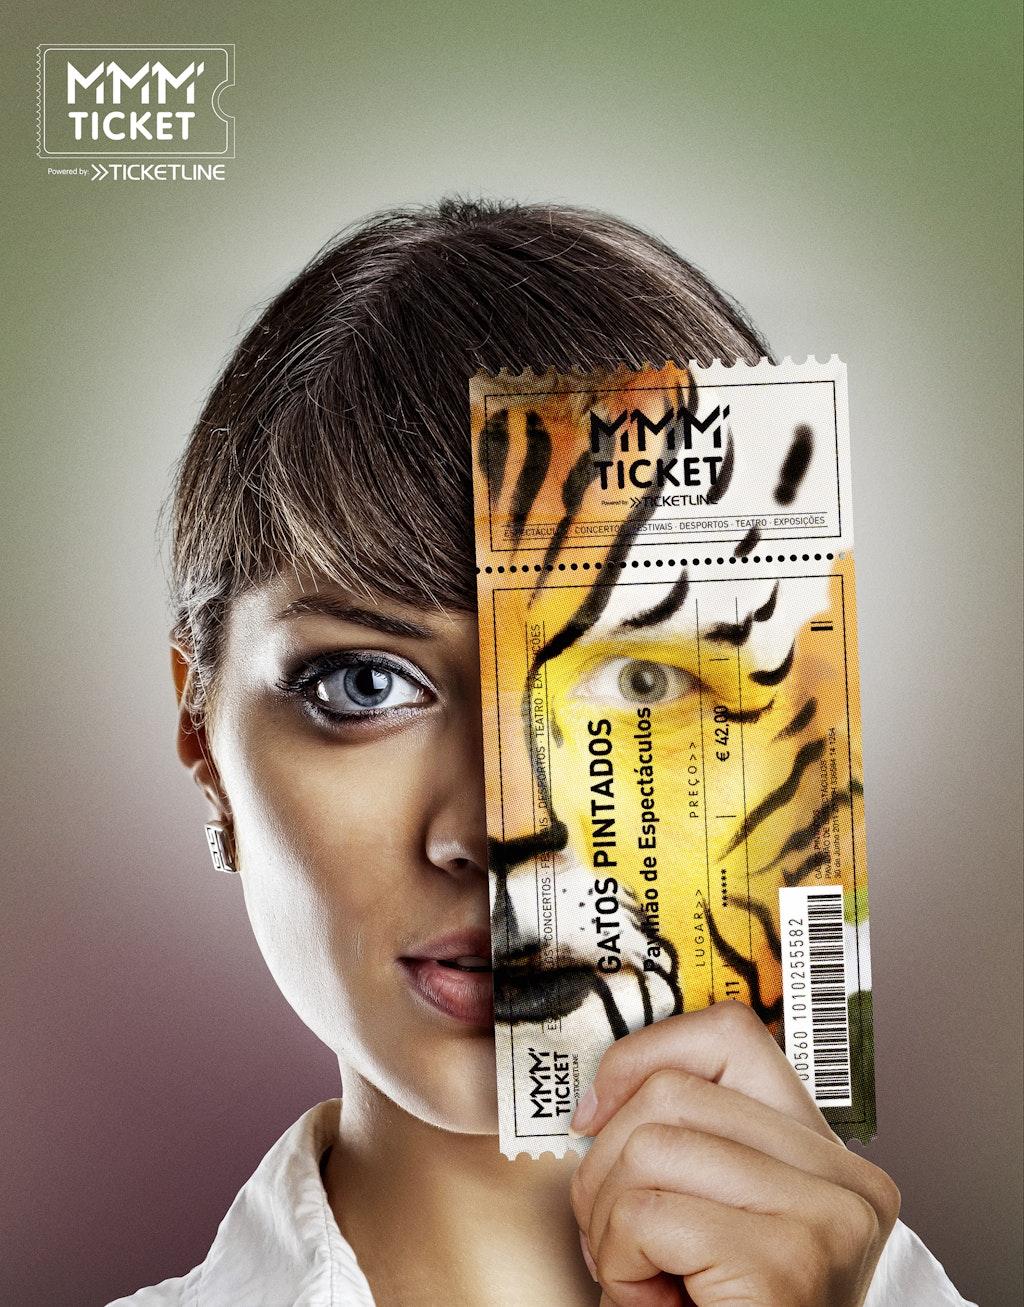 MMM Ticket